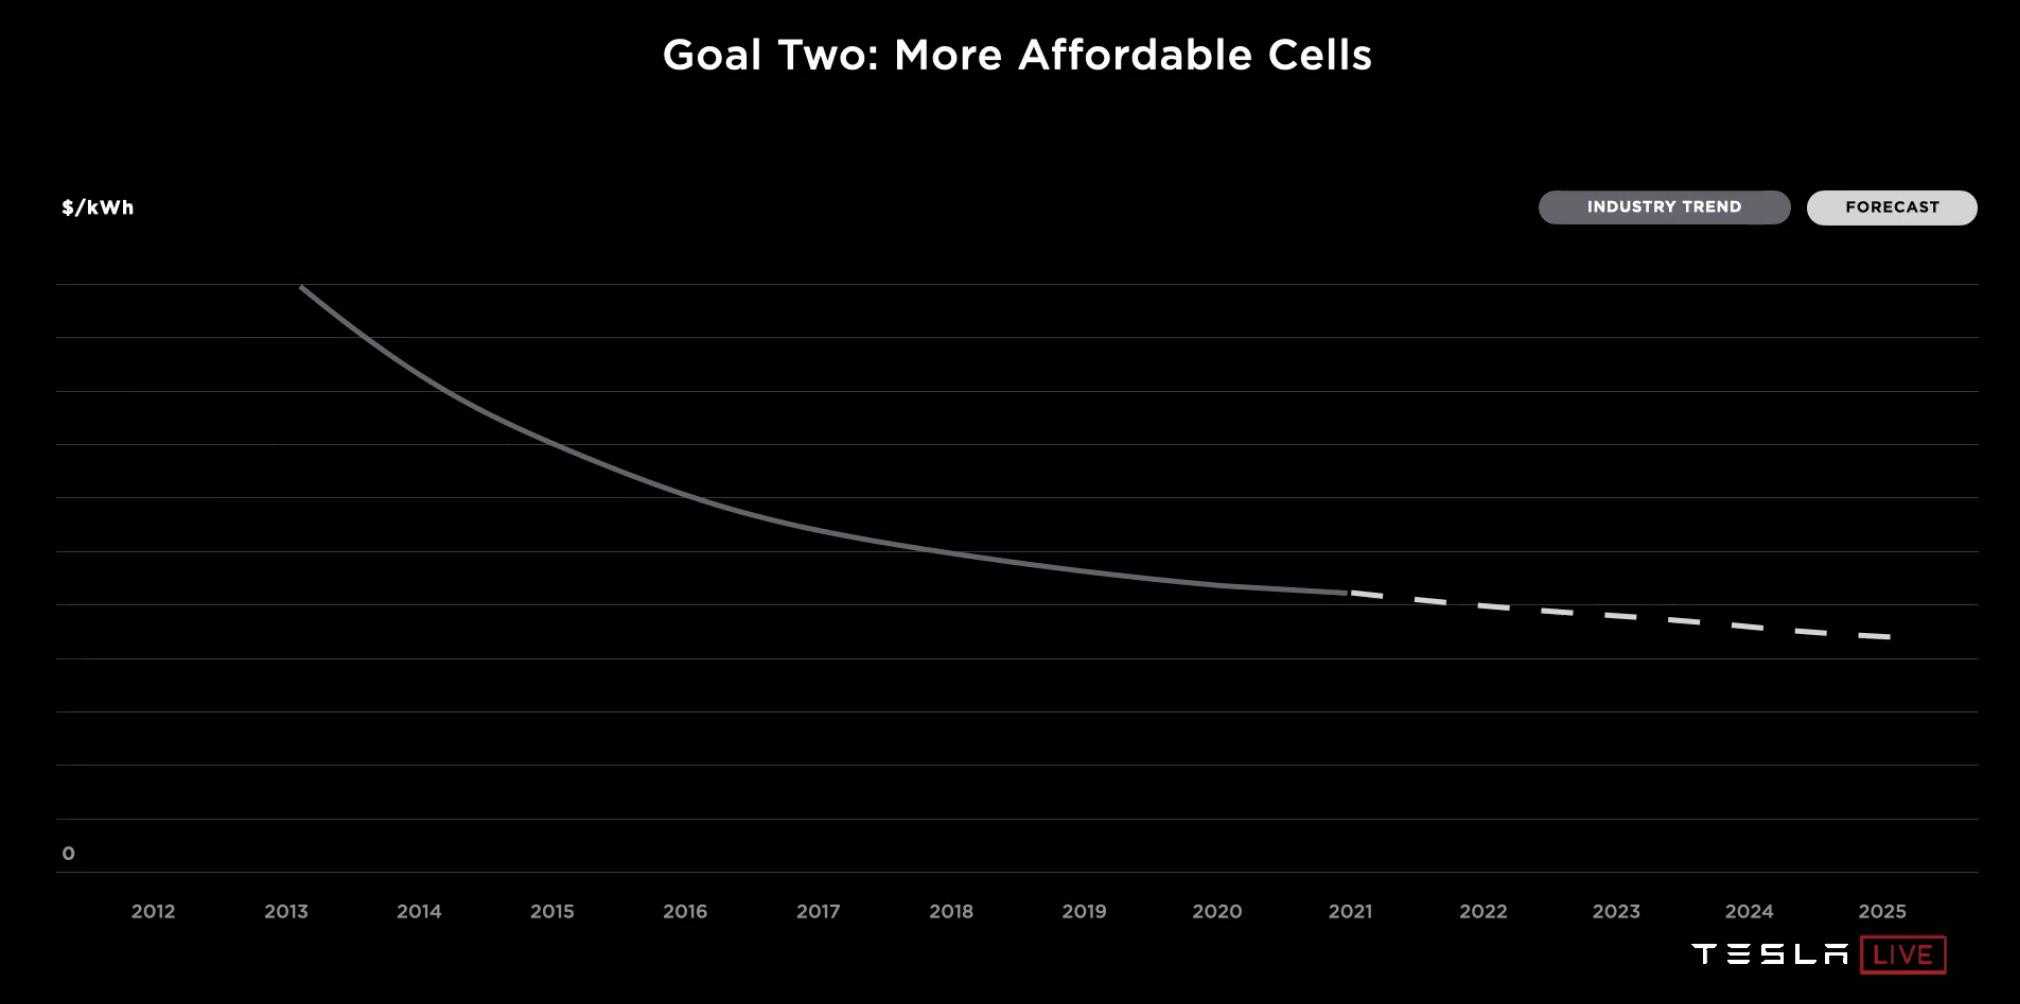 tesla-cell-affordability